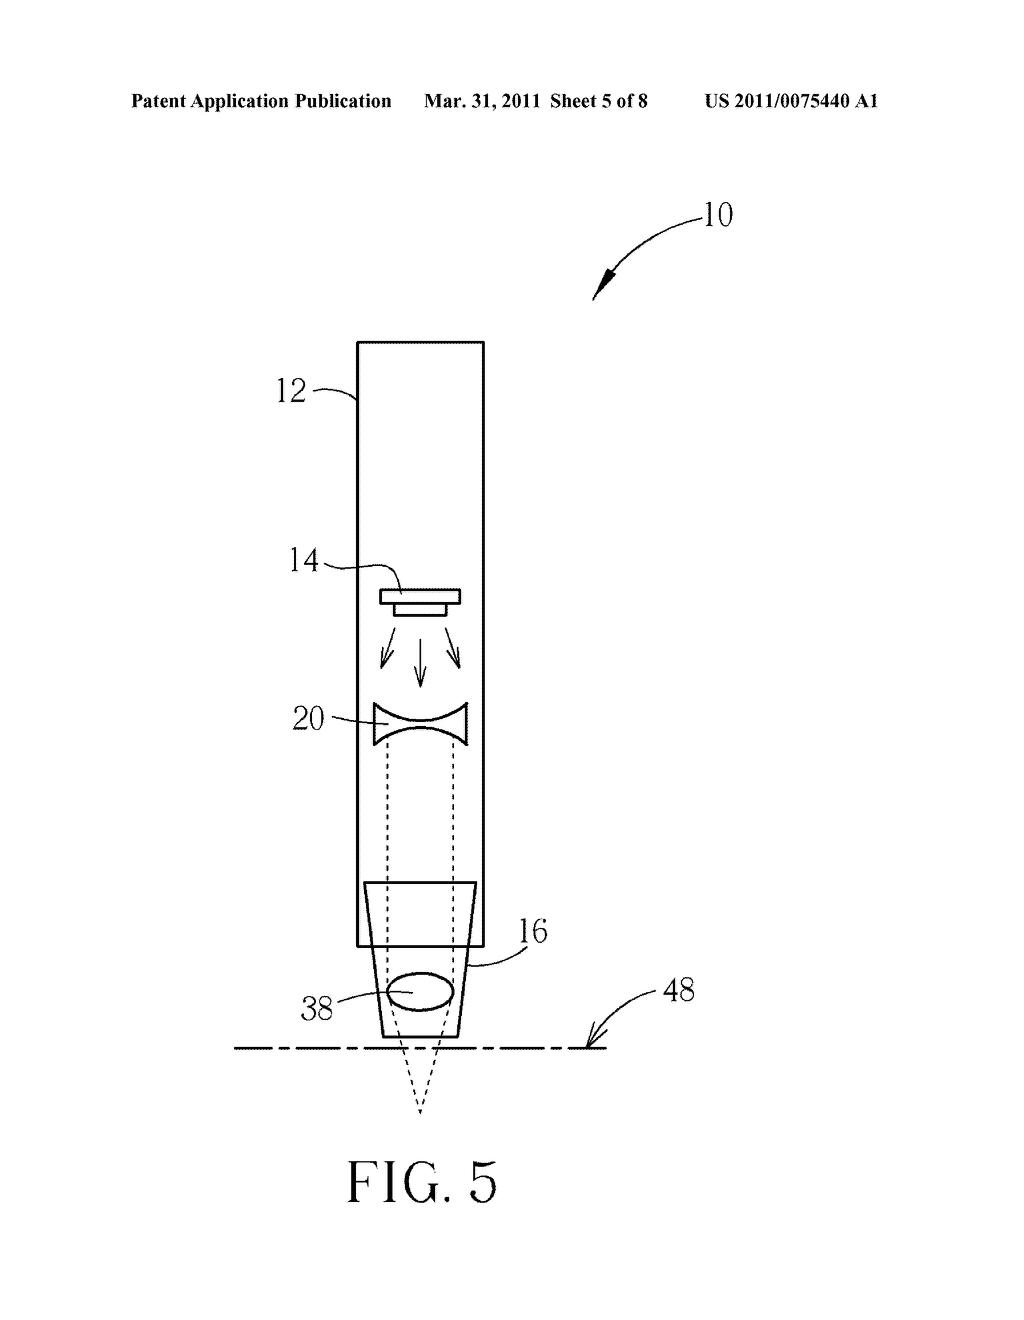 Diagram Of Pen Mastering Wiring Penn Reel Parts Light Schematic And Image 06 Rh Patentsencyclopedia Com Pendulum Penguinpro350b